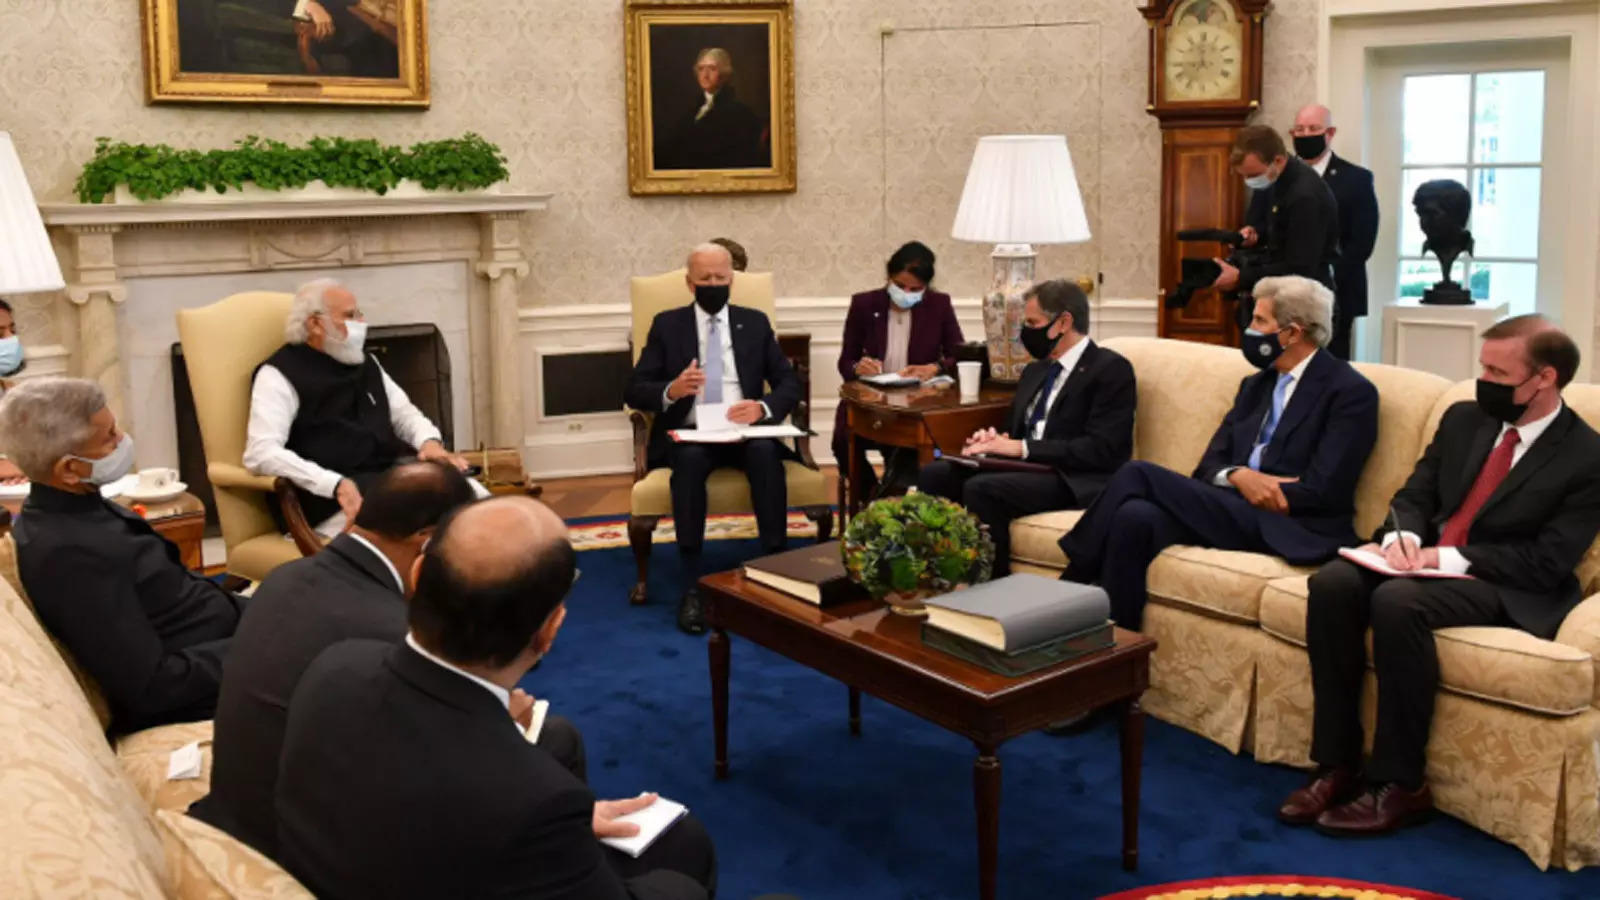 seeds-sown-under-prez-biden-to-transform-india-us-relations-pm-modi-at-white-house